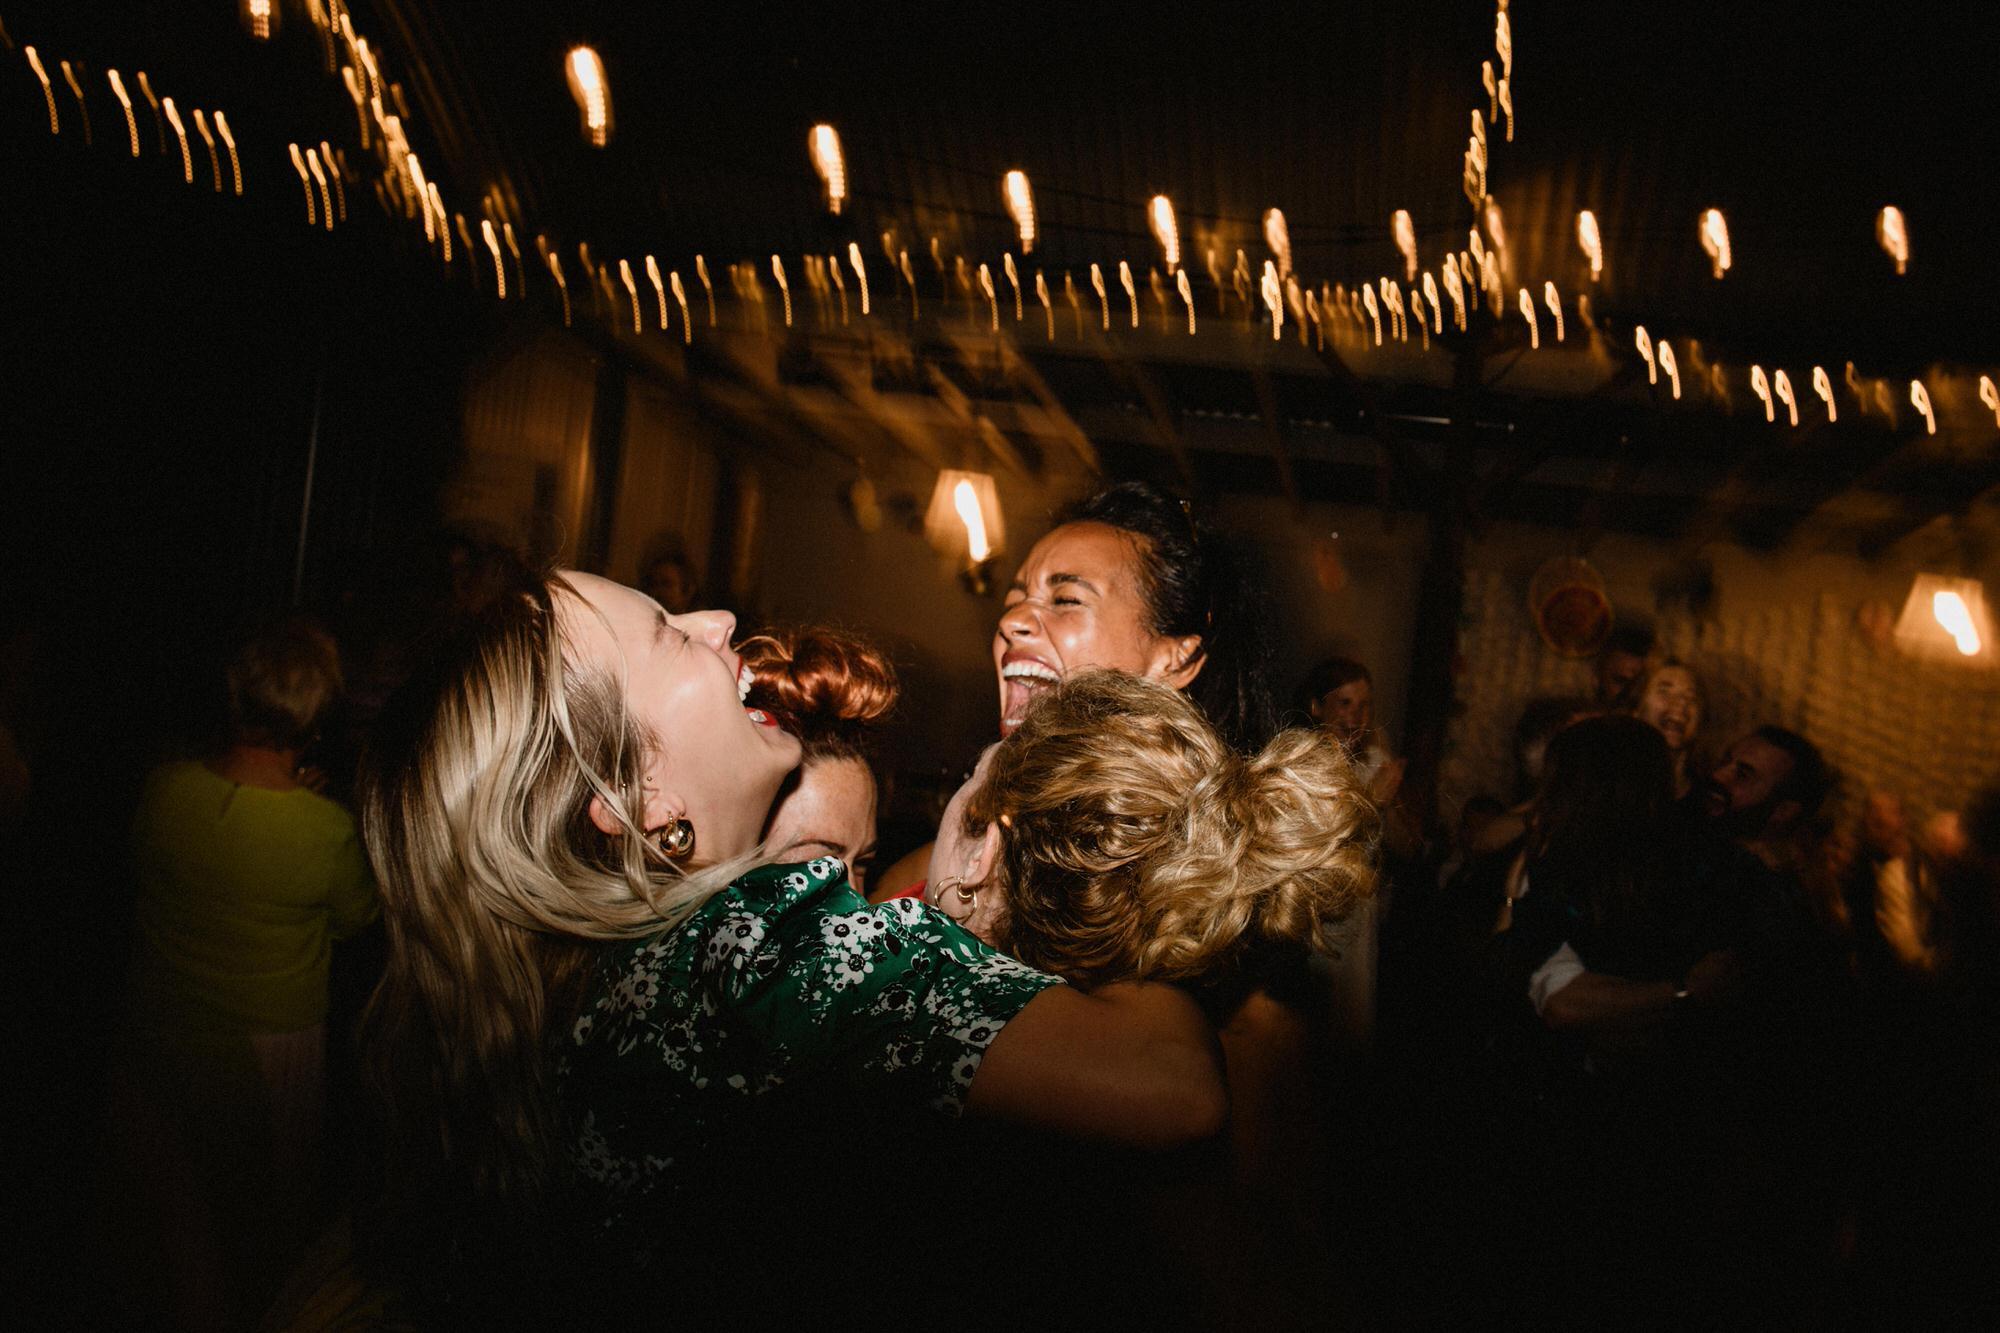 083 TIN SHED KNOCKRAICH WEDDING AUTUMN ZOE ALEXANDRA PHOTOGRAPHY